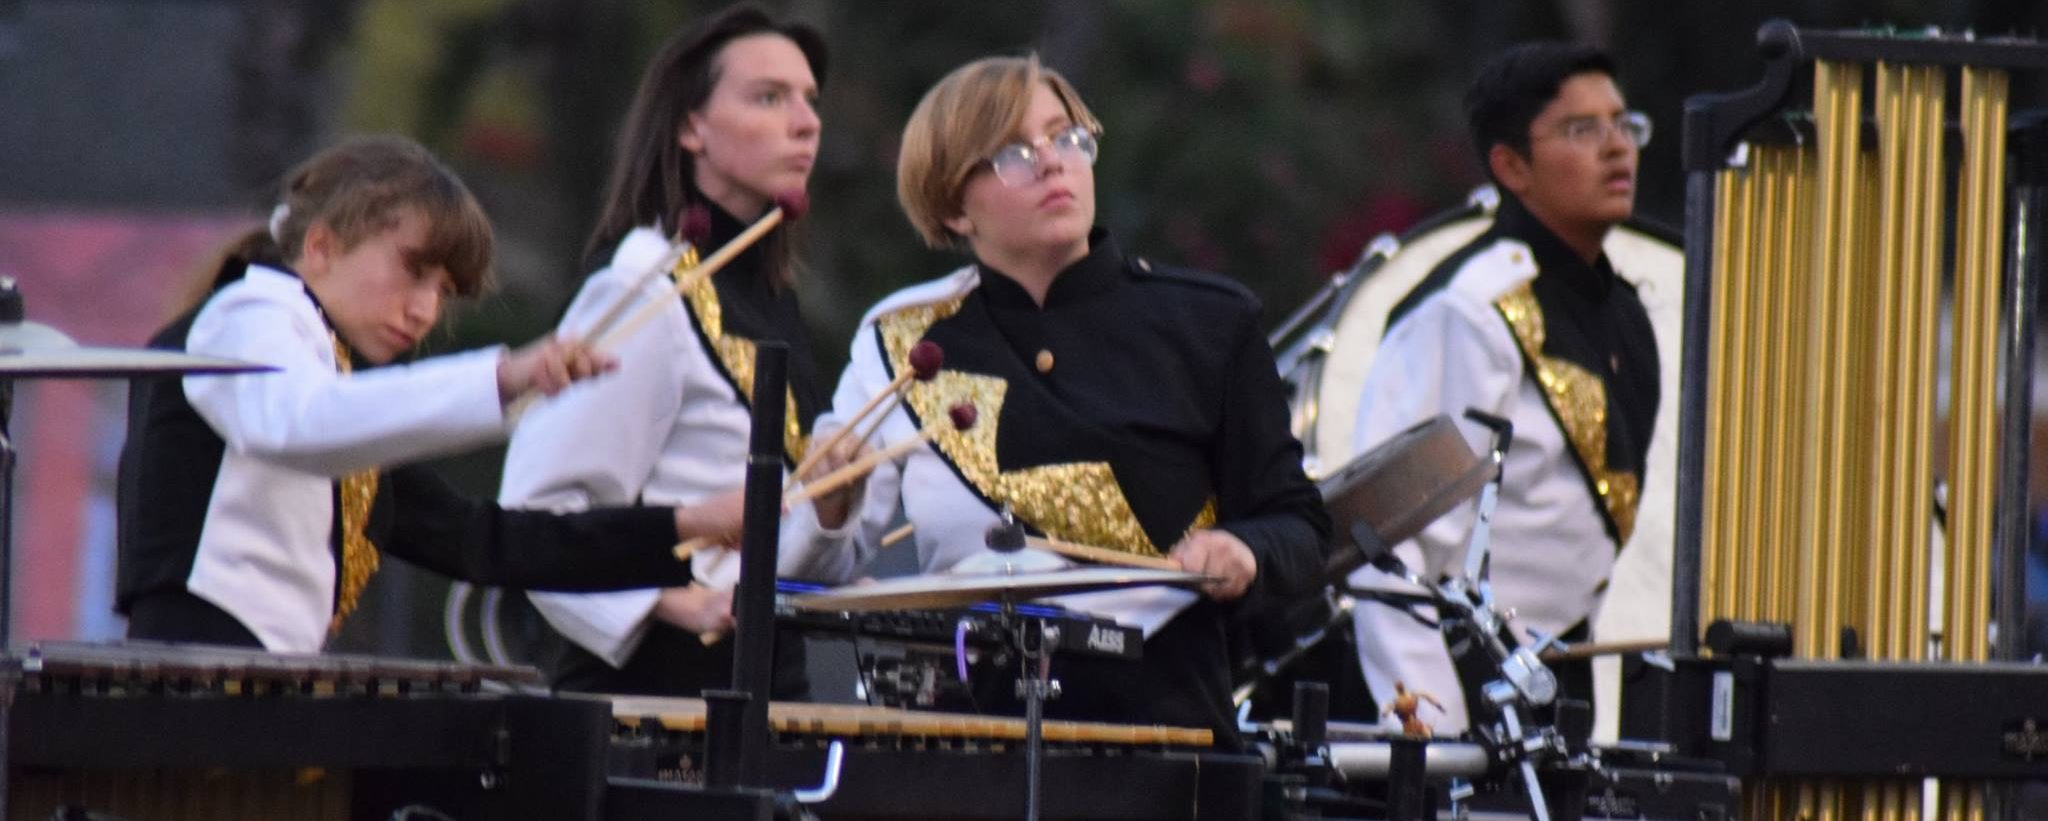 Yucca Valley High School Music Department